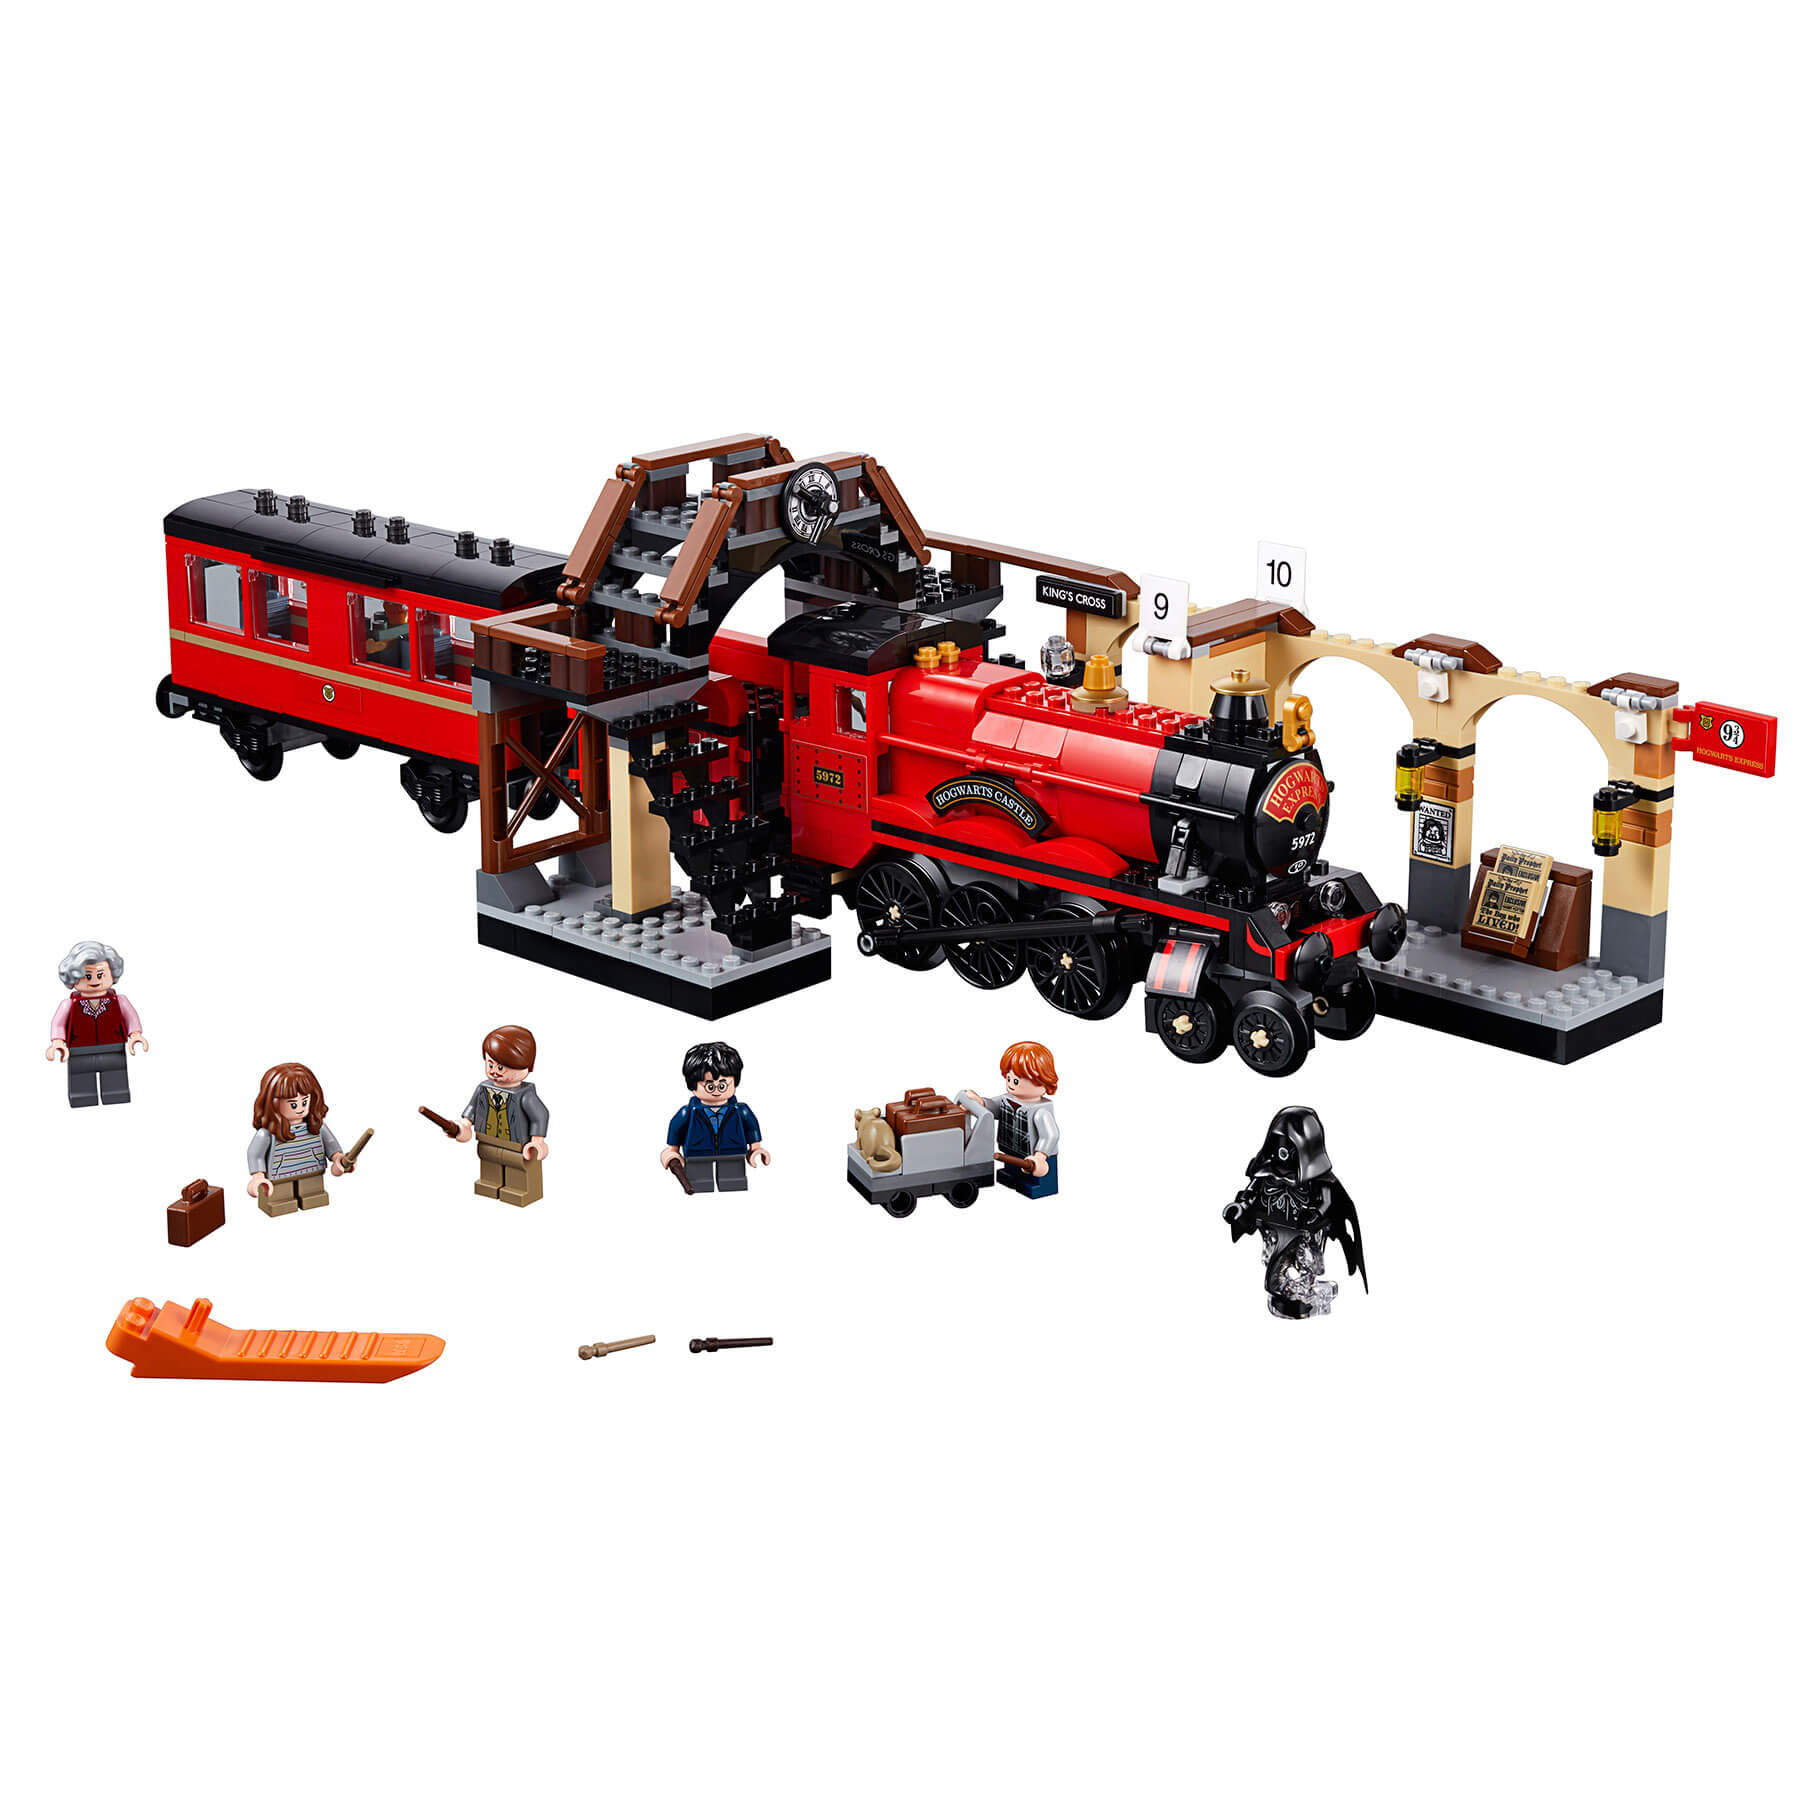 Mua đồ chơi LEGO 75955 - LEGO Harry Potter 75955 - Chuyến Tàu Hogwarts Express (LEGO Harry Potter 75955 Hogwarts Express)